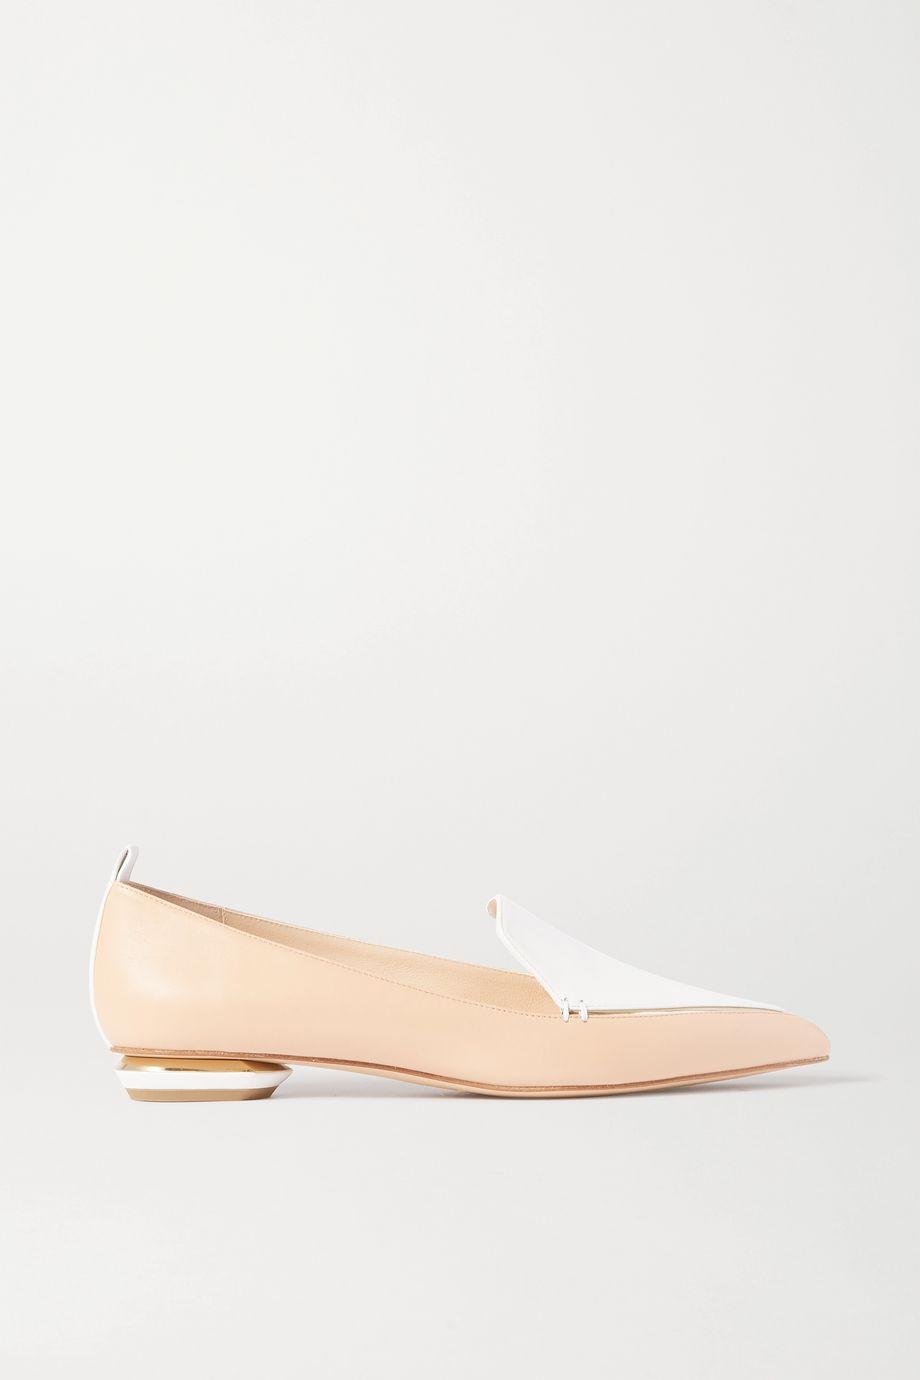 Nicholas Kirkwood Beya two-tone leather point-toe flats